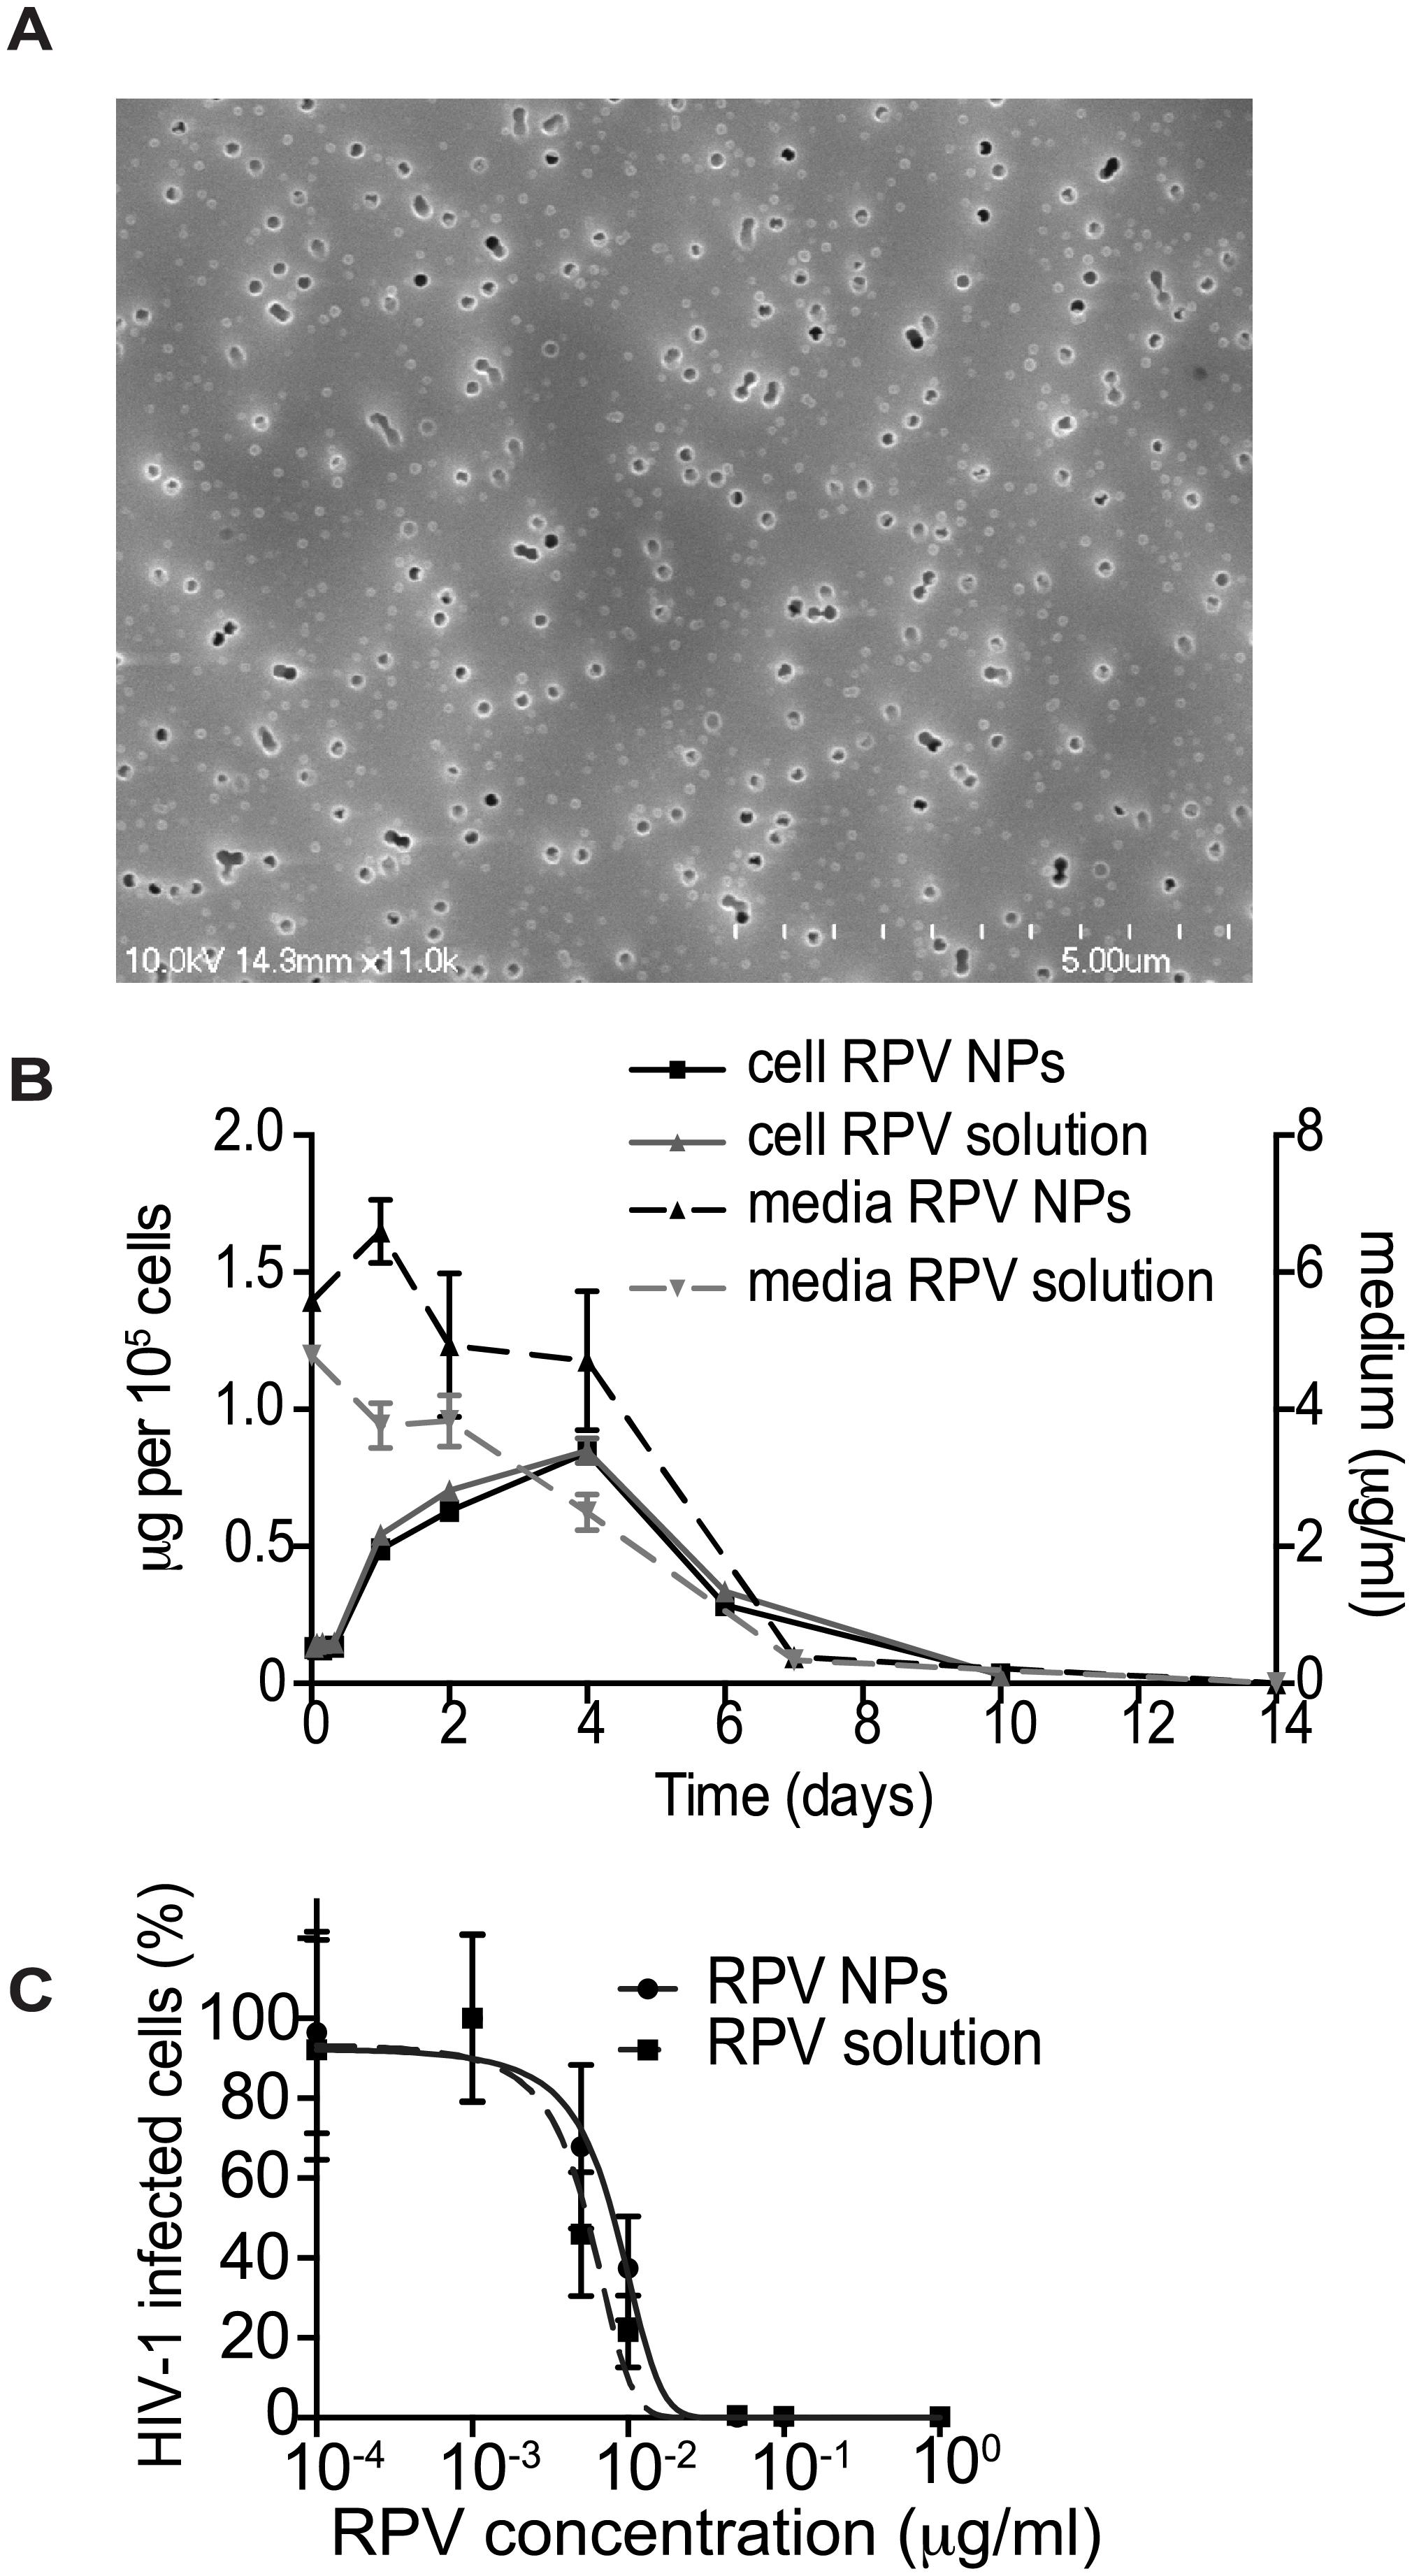 <i>In vitro</i> characterization of PLGA/RPV NPs in thermosensitive gel.